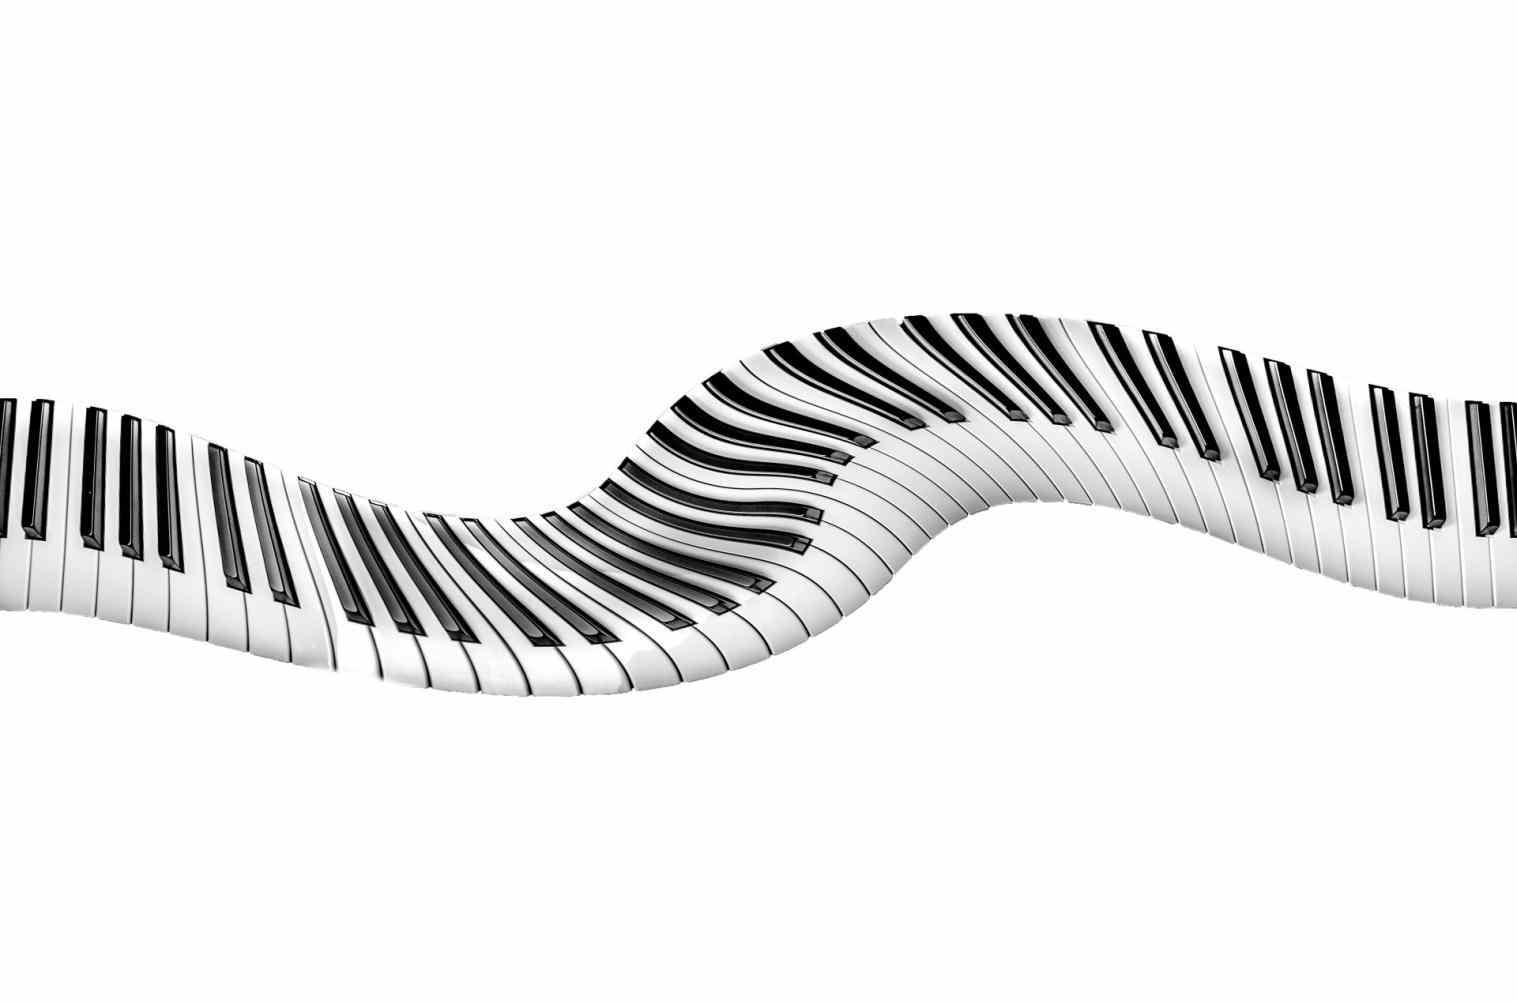 1517x1004 Keys Drawing Art U Clipart Download Keyboard Black And White Panda